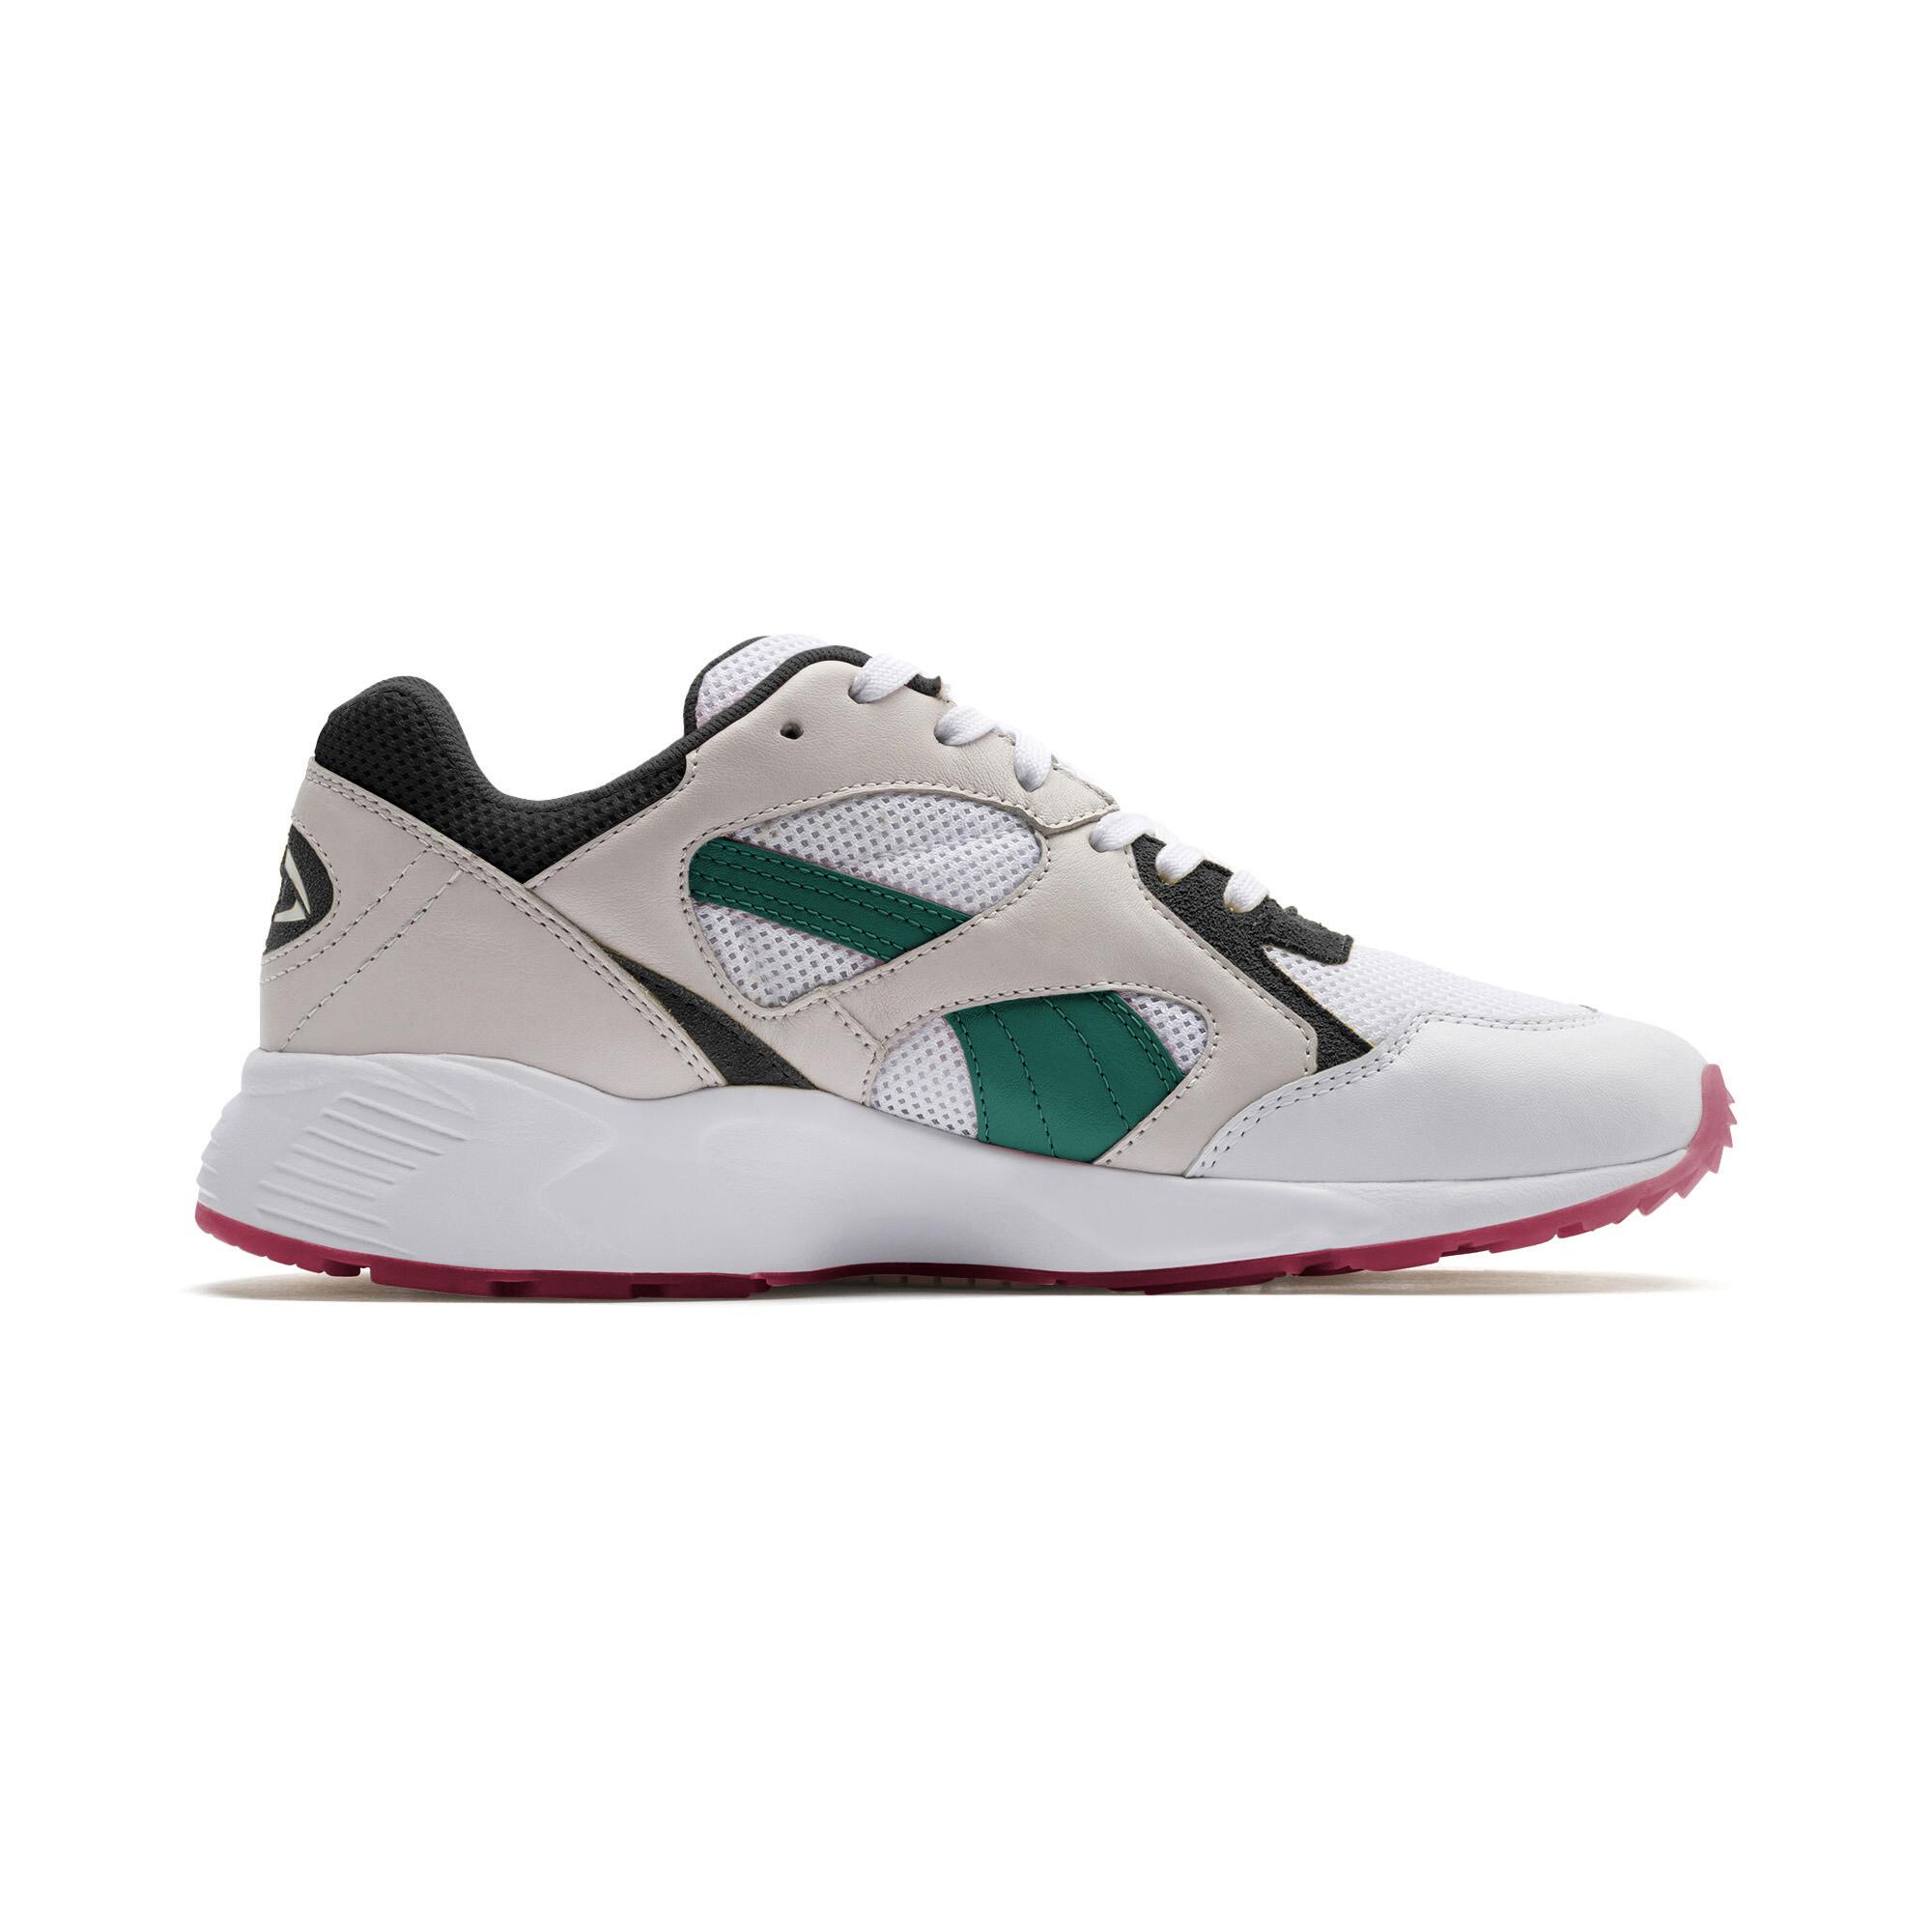 PUMA-Prevail-Classic-Sneakers-Unisex-Shoe thumbnail 12